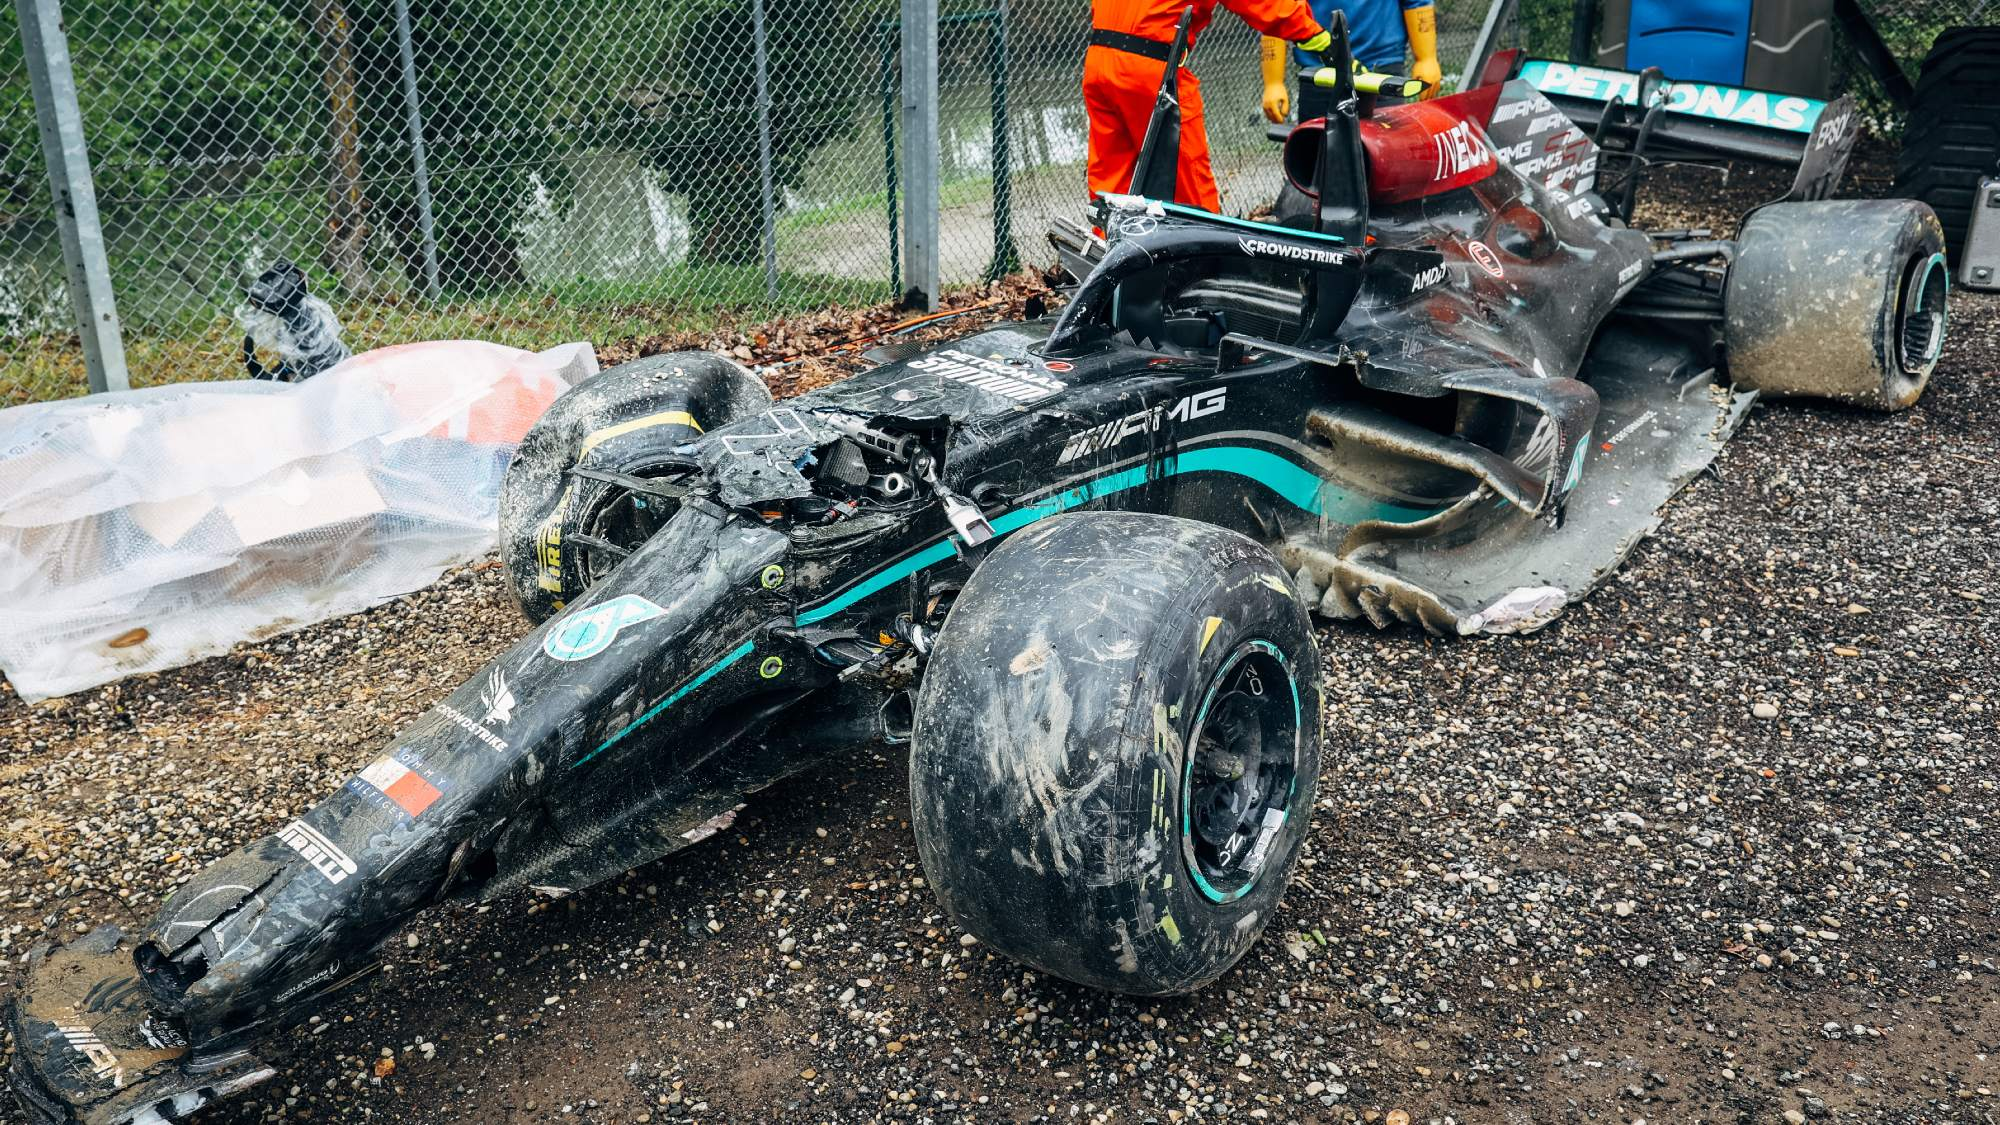 Valtteri Bottas, 2021 Imola GP